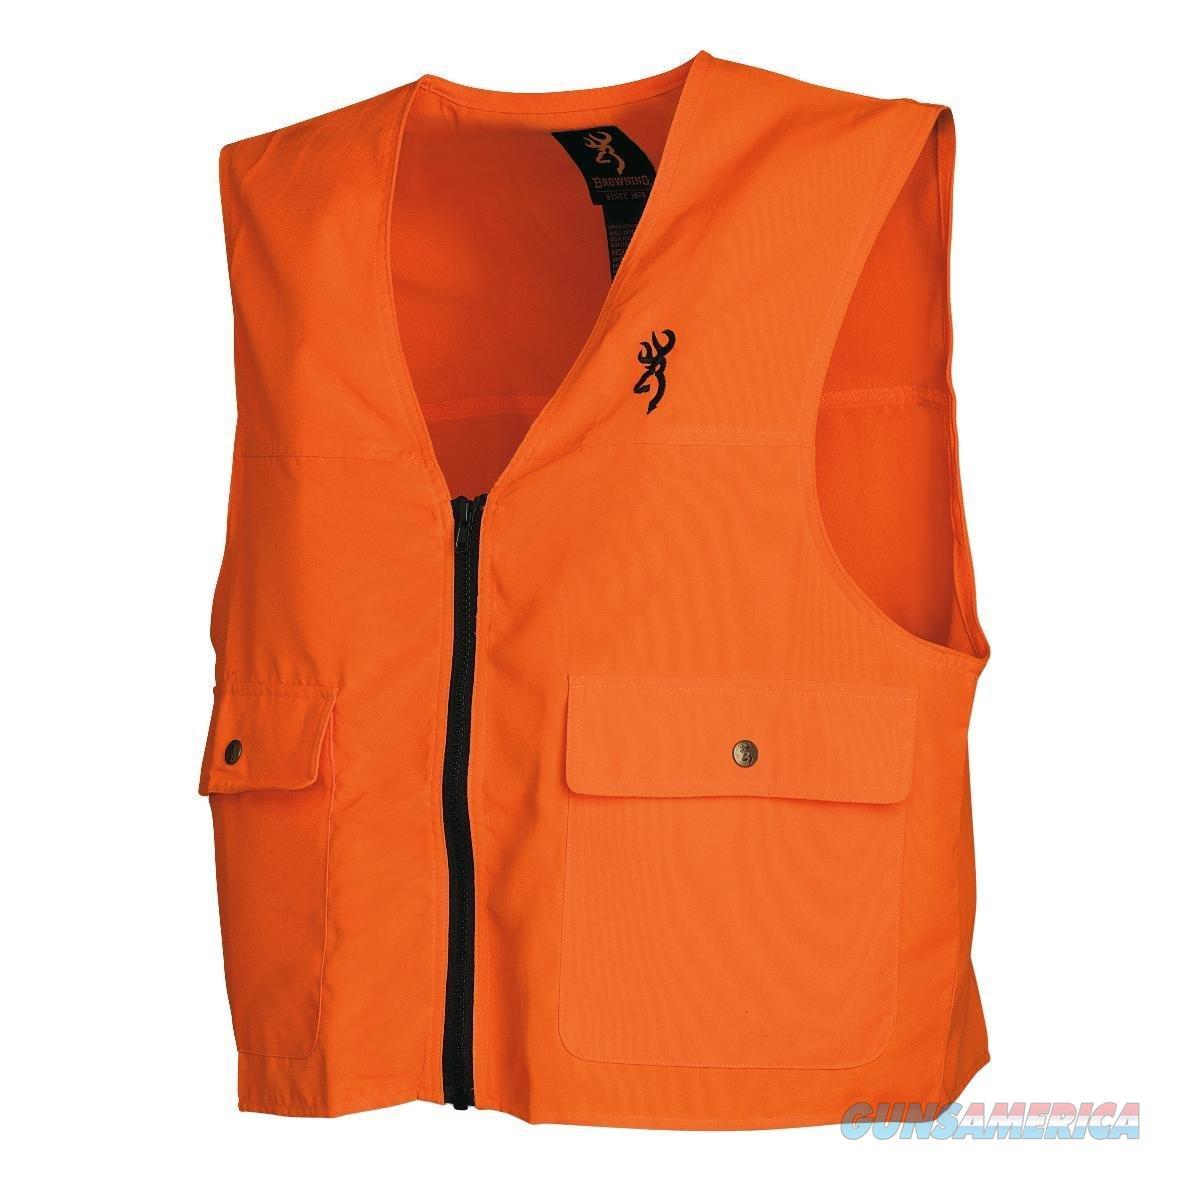 Browning Safety Vest 3XL Blaze Orange  Non-Guns > Hunting Clothing and Equipment > Clothing > Blaze Orange